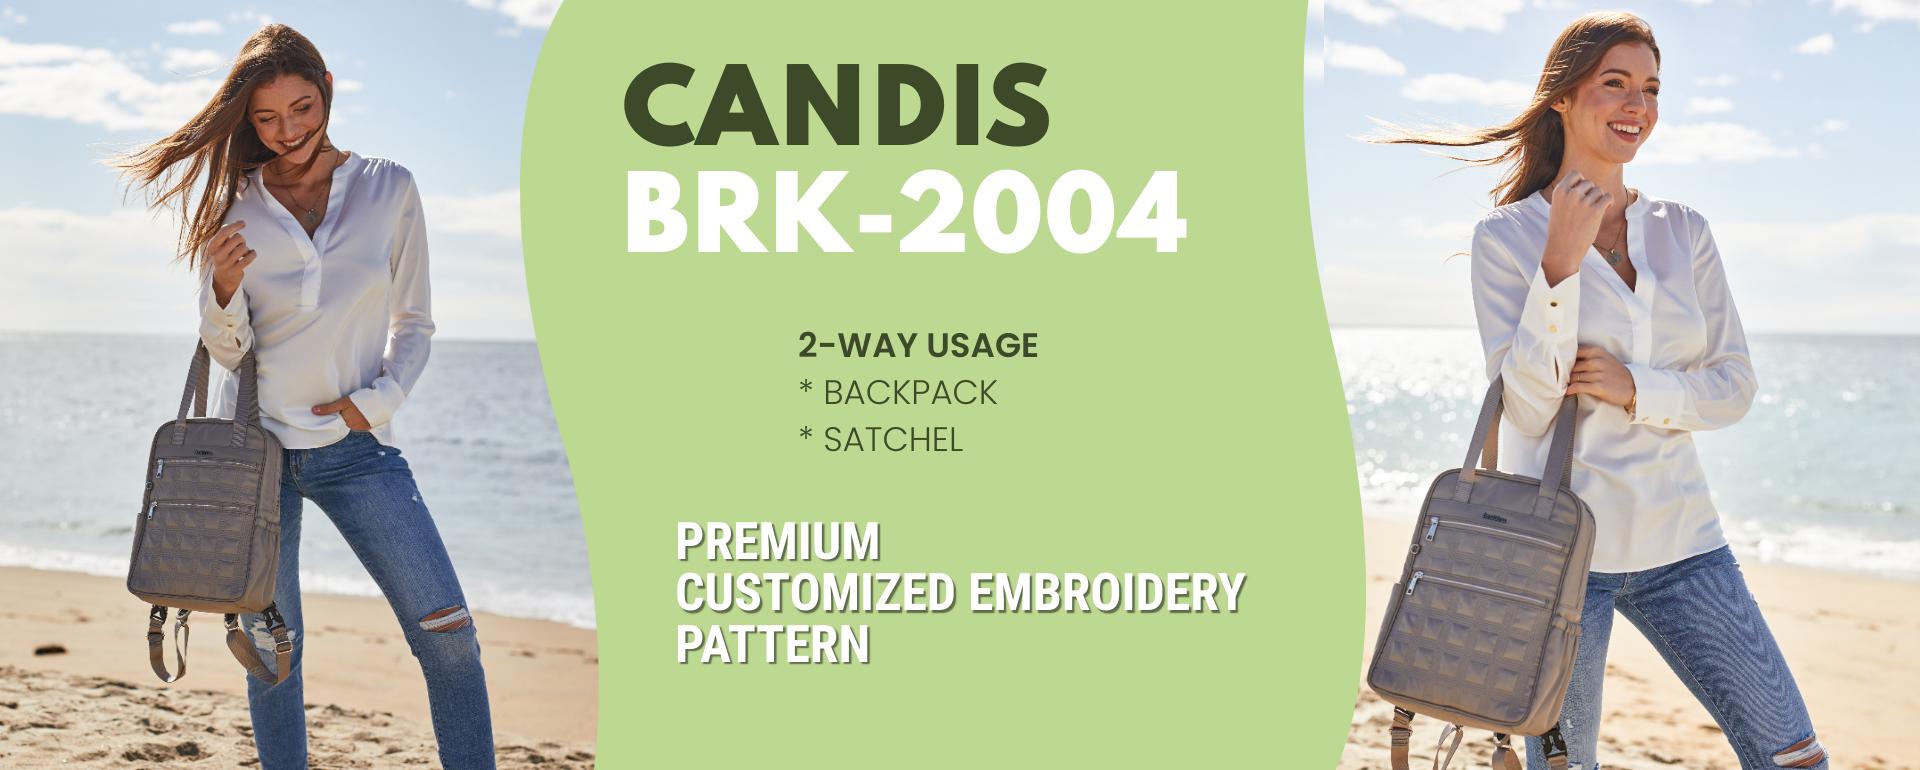 beside-u BRK2004-684 Candis Stone Gray backpack purses fashion handbags designer bags spring banner